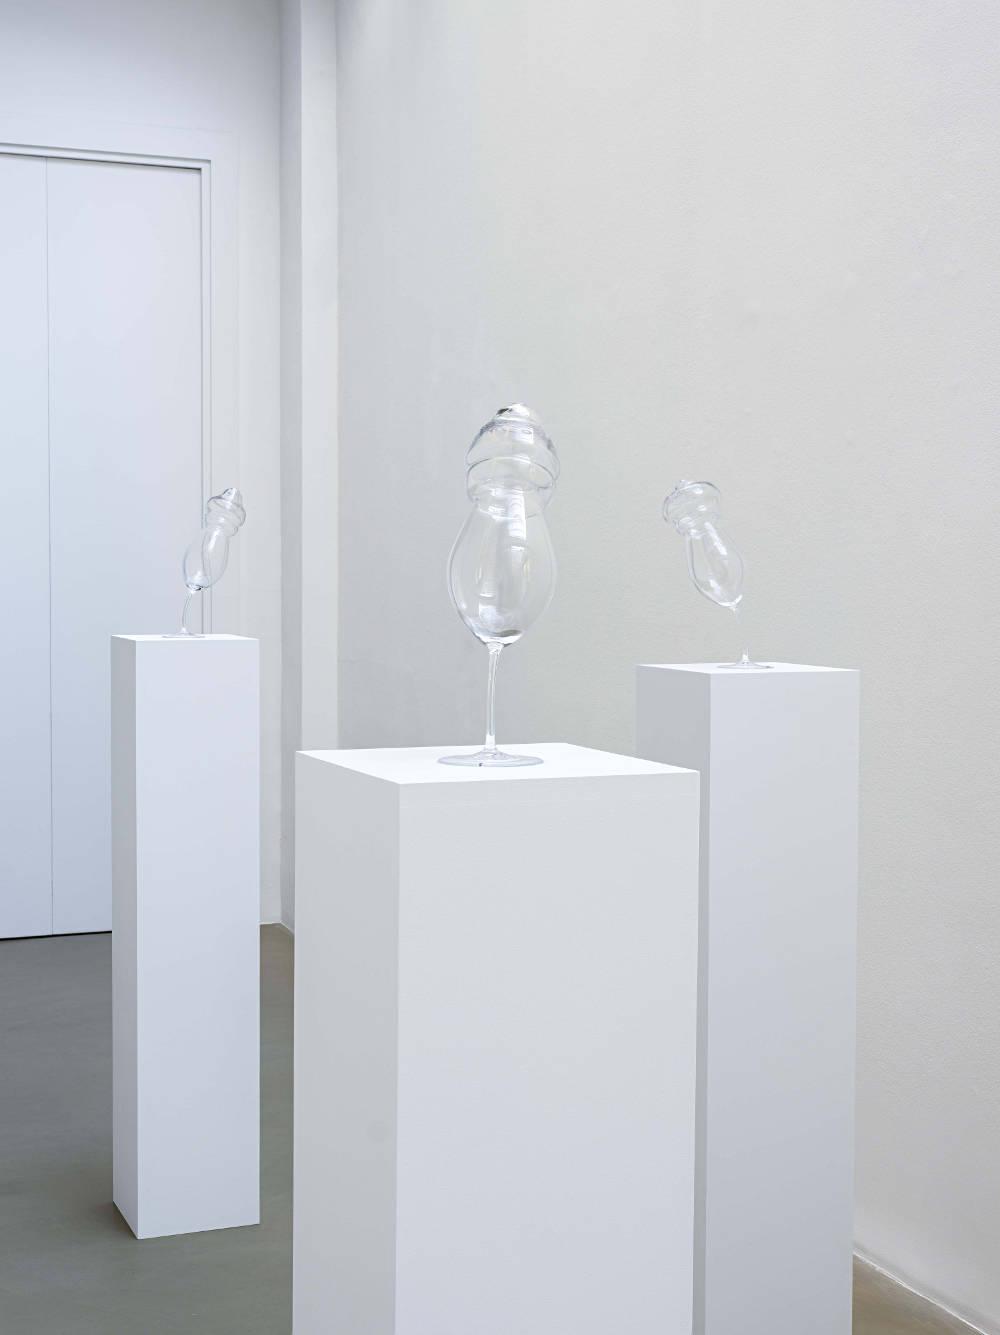 Galerie Chantal Crousel Anri Sala 4